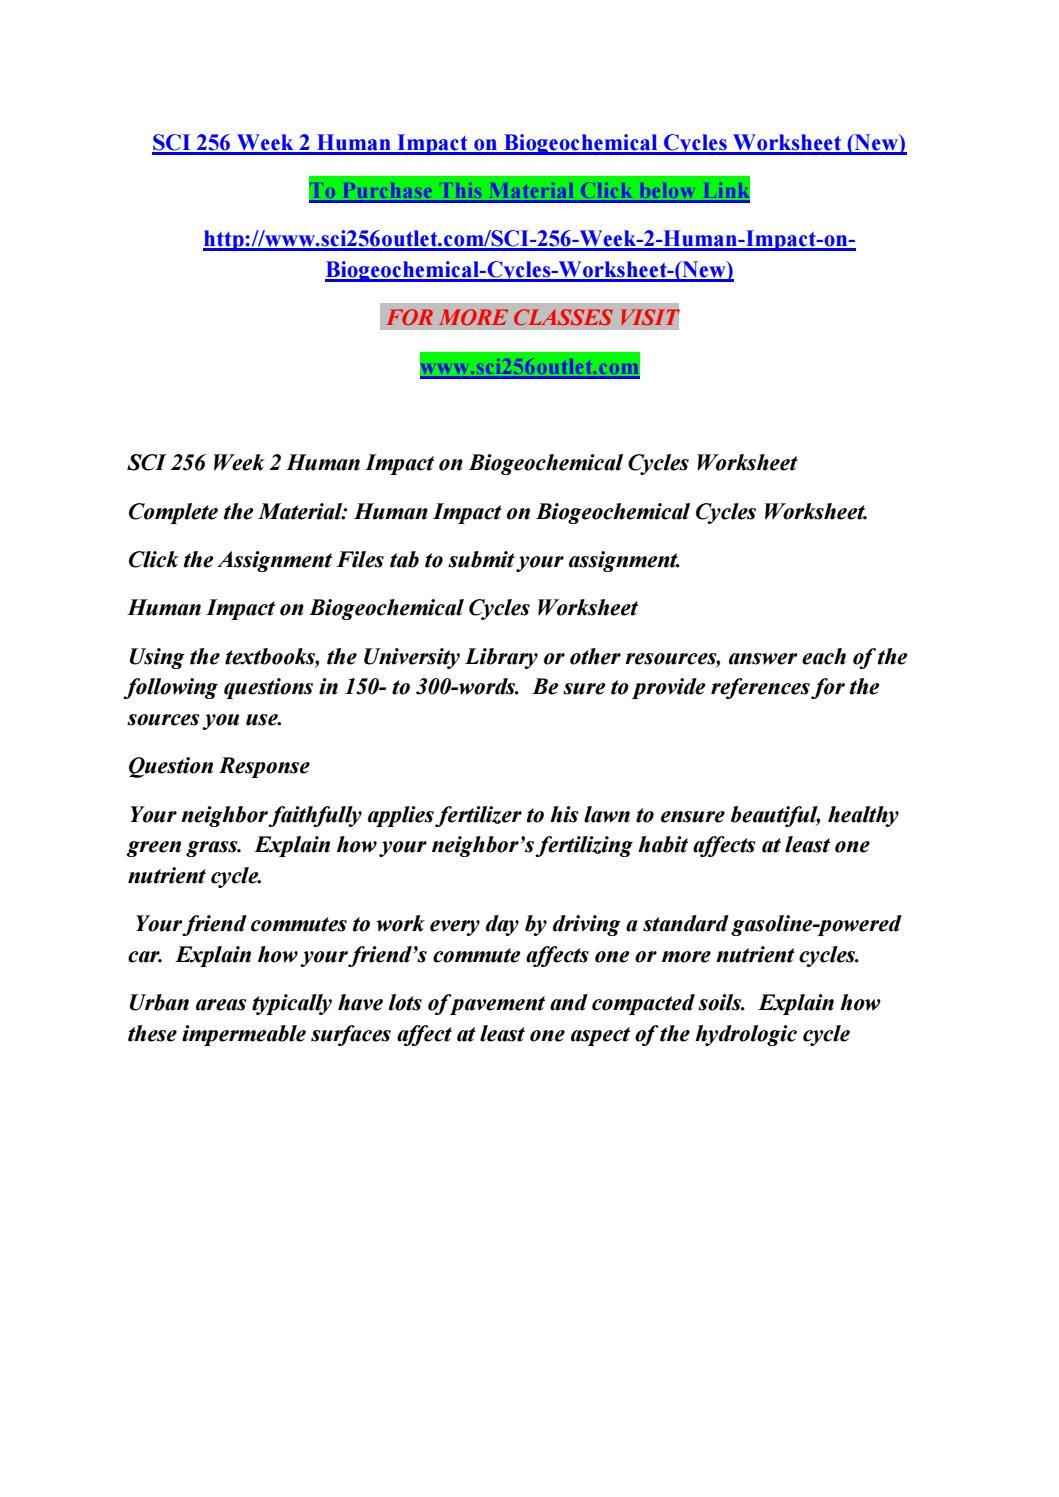 Biogeochemical Cycles Worksheet Answers